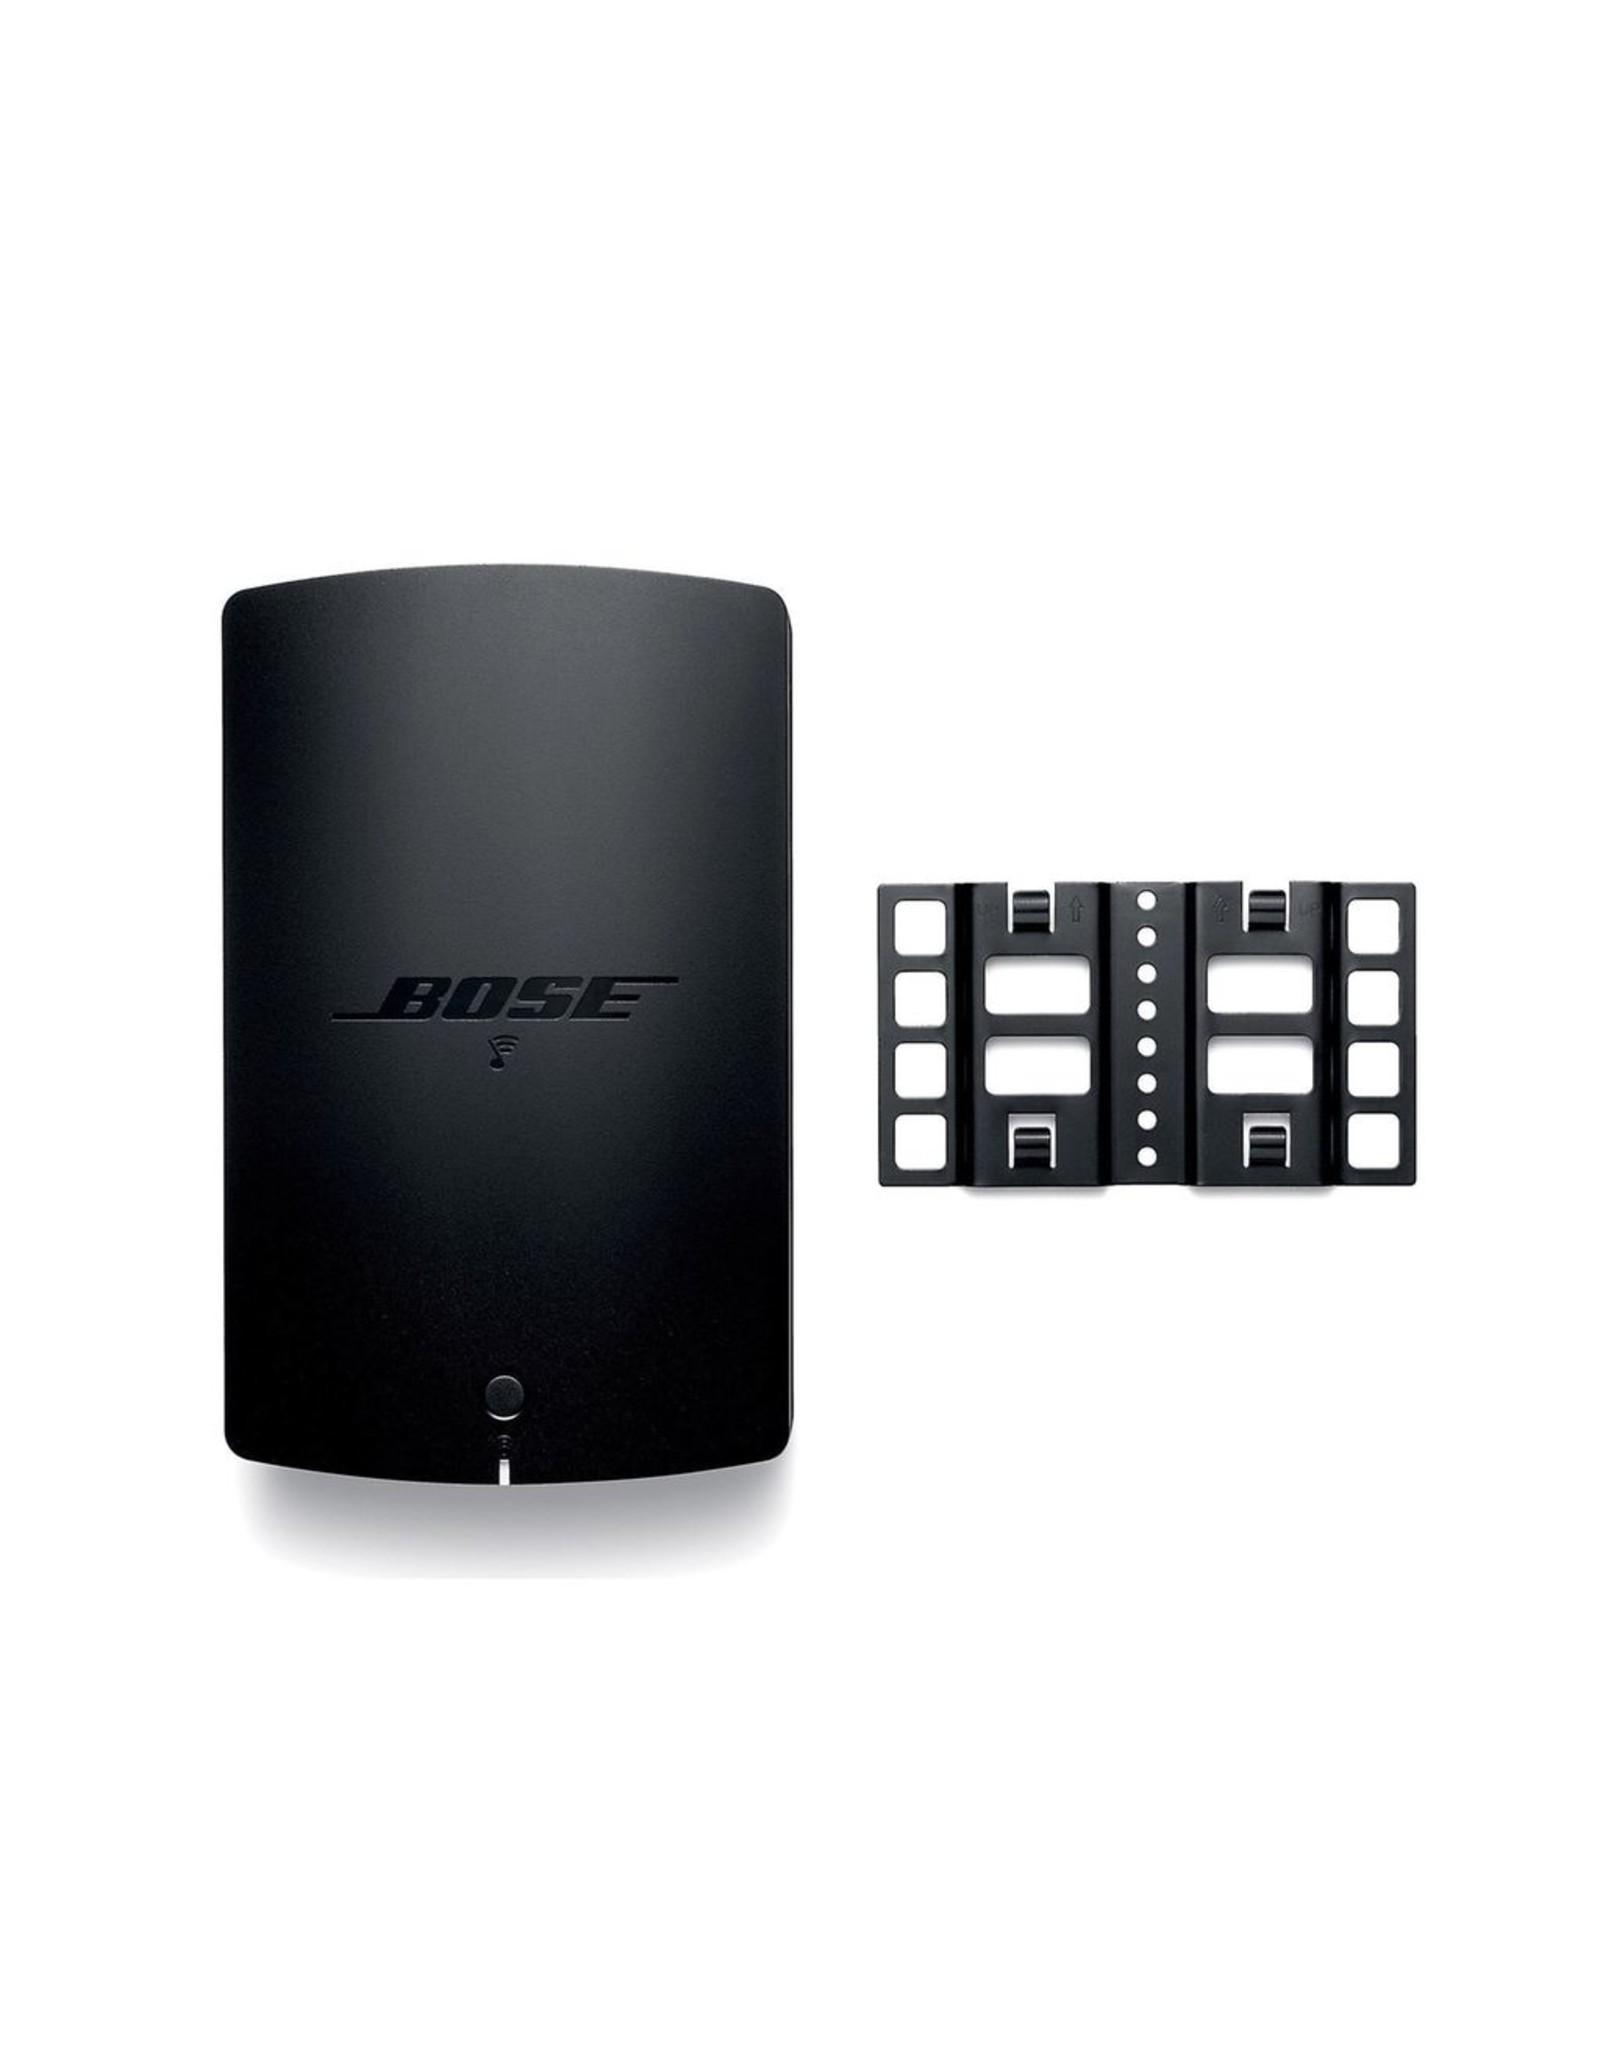 BOSE SA-5 Amplifier